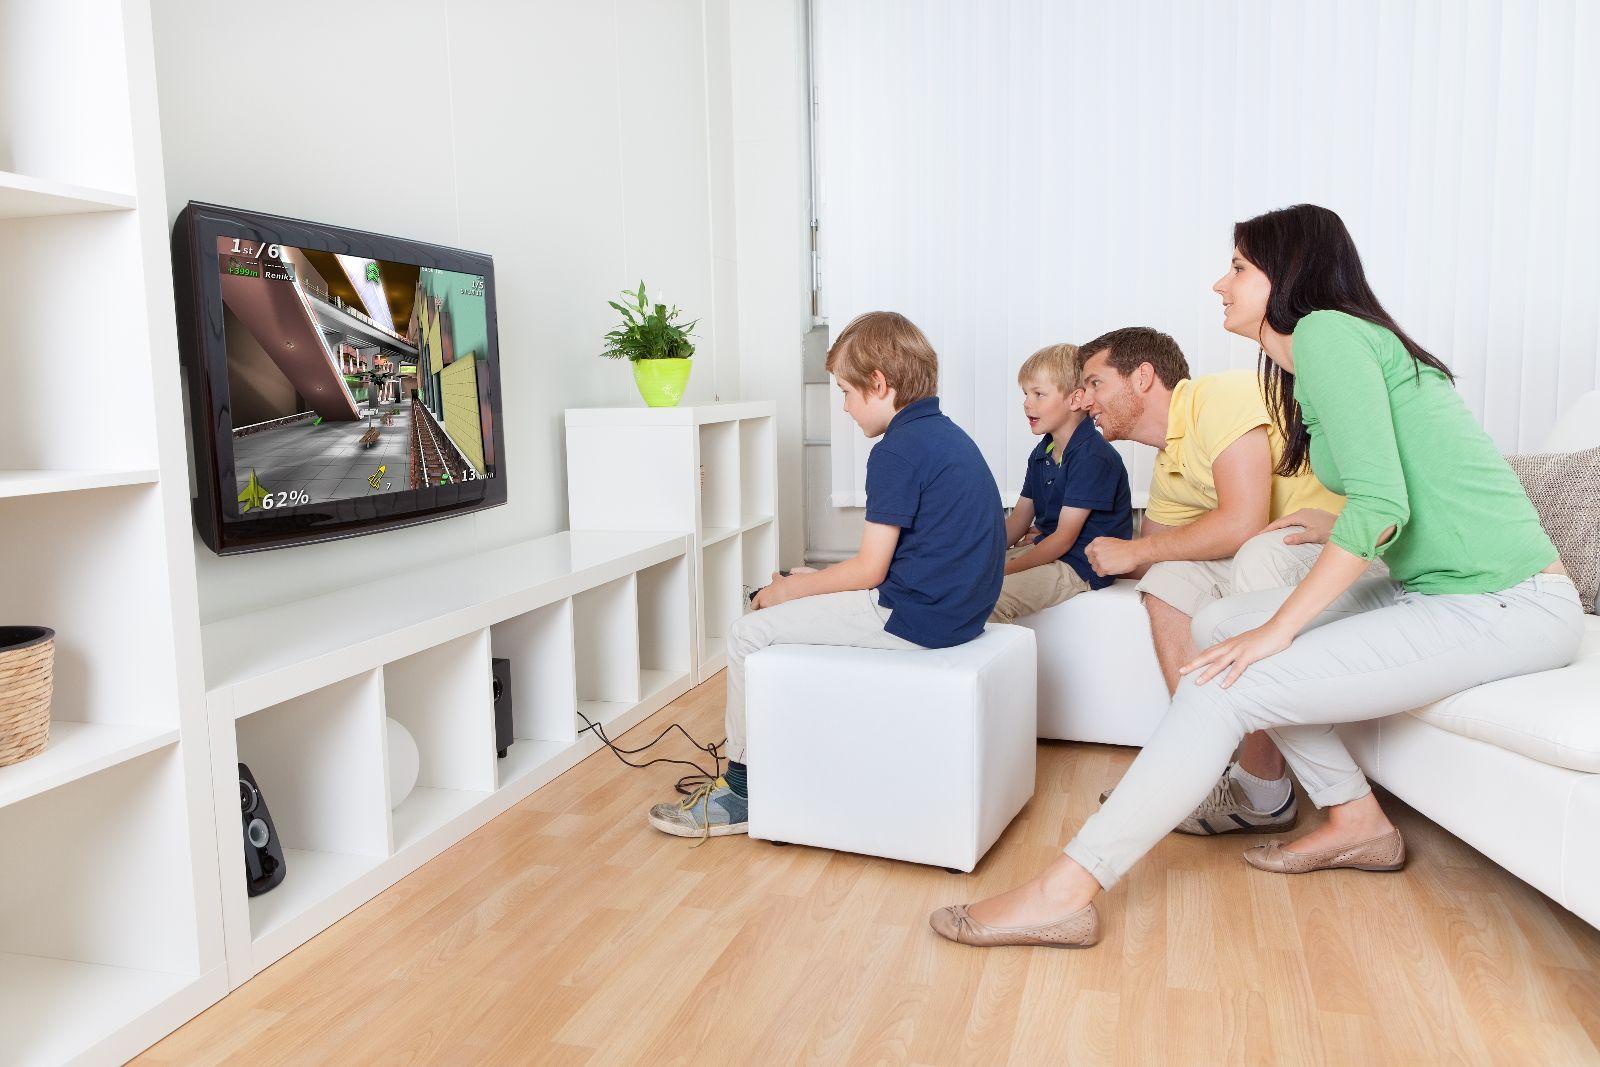 Familia Joven Jugando Videojuegos